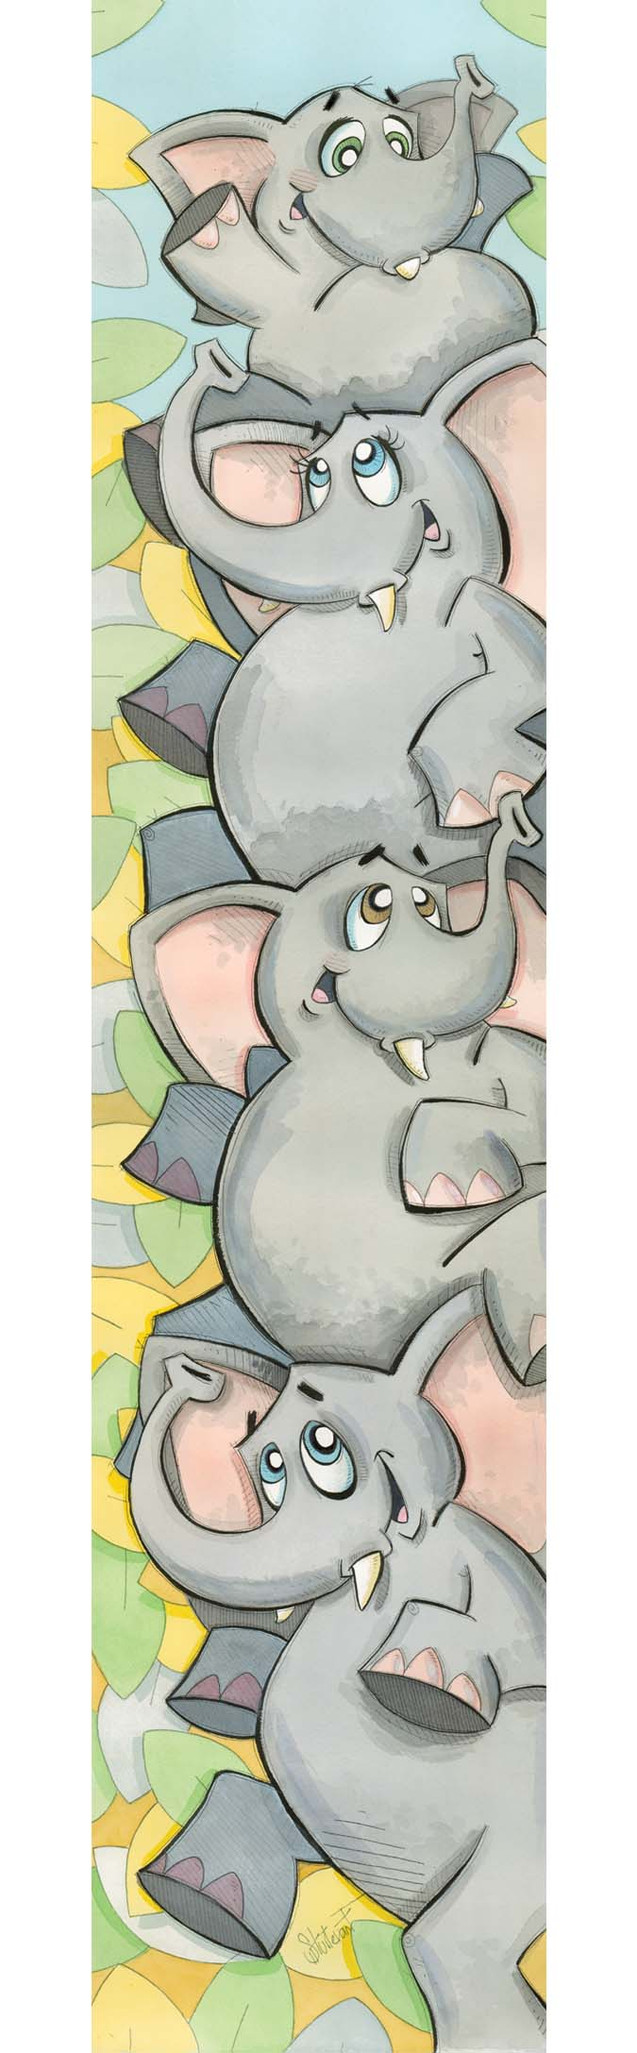 Elephants Piled High